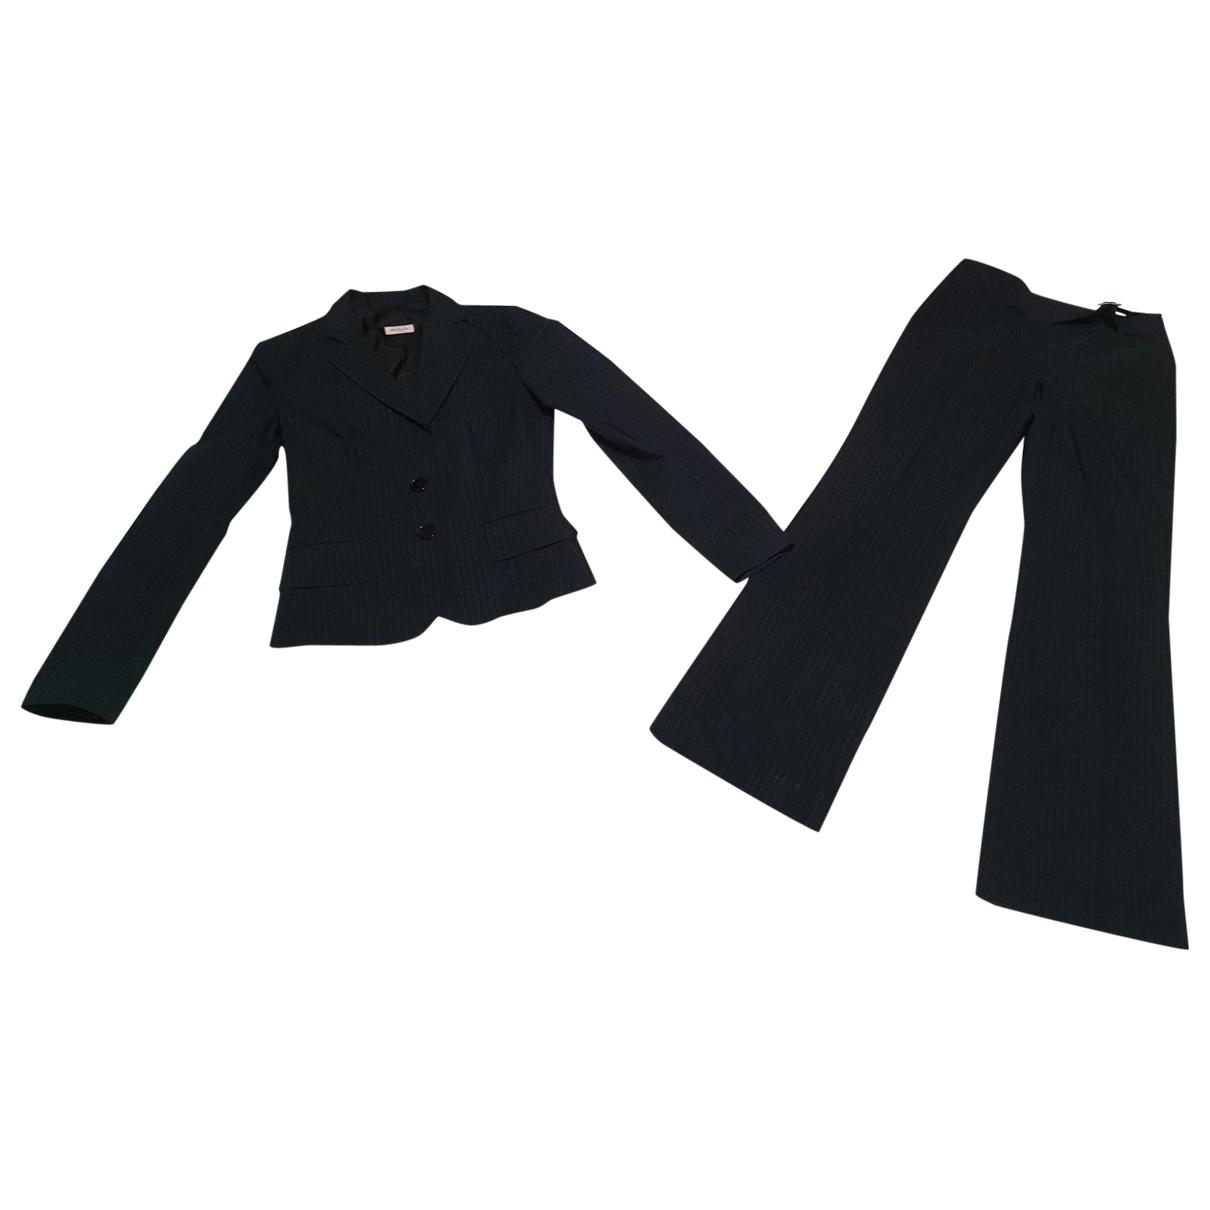 Max & Co \N Kleid in  Schwarz Baumwolle